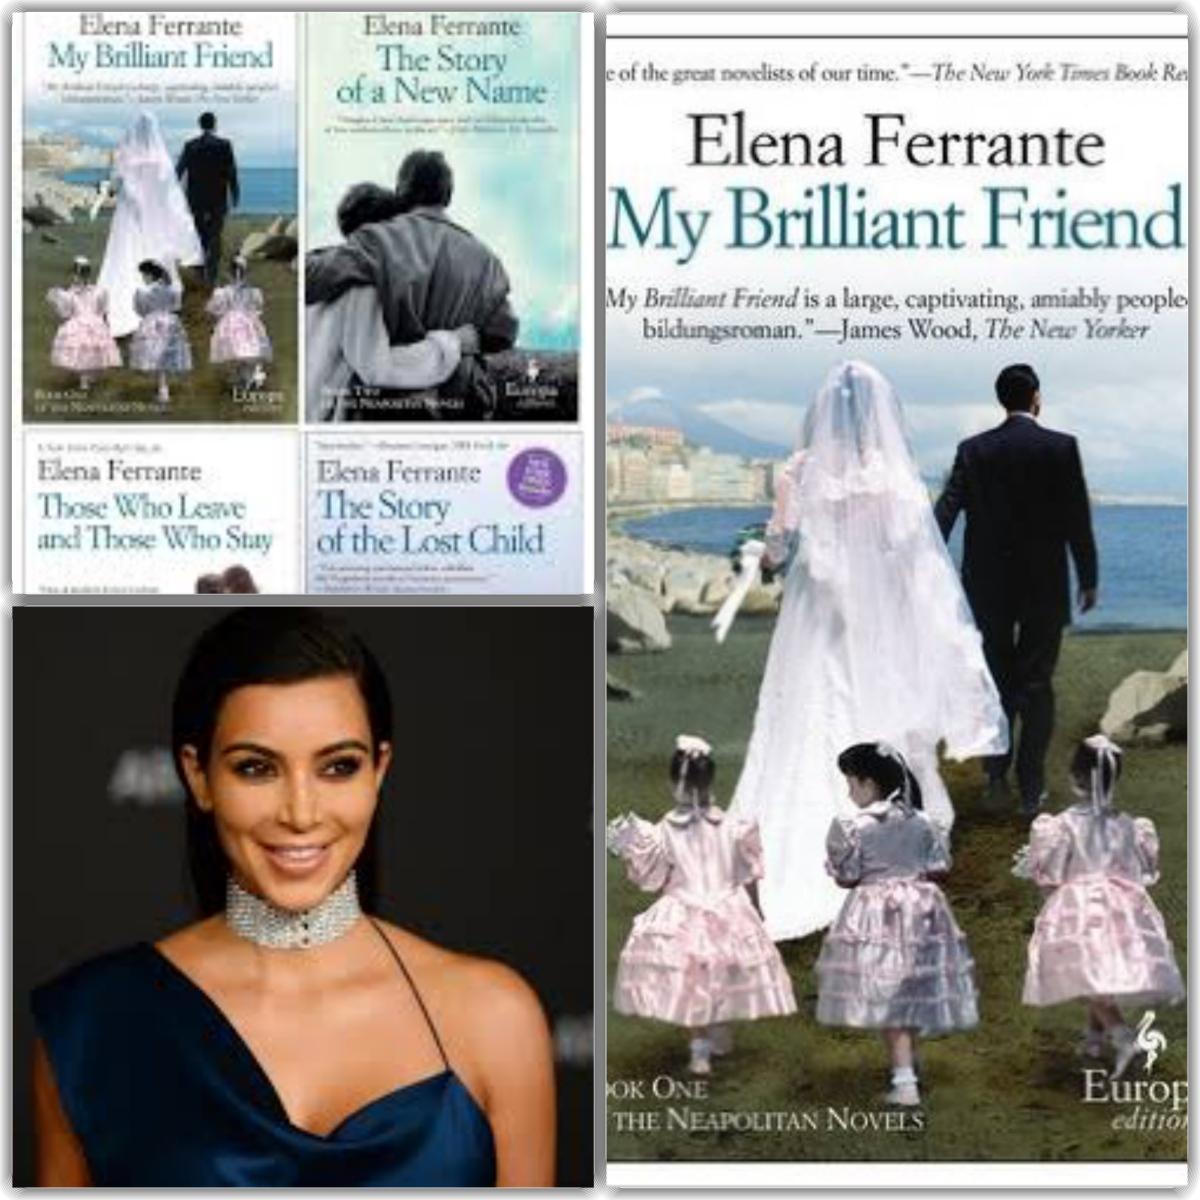 Kim Kardashian and Elena Ferrante: the problem with public privacy